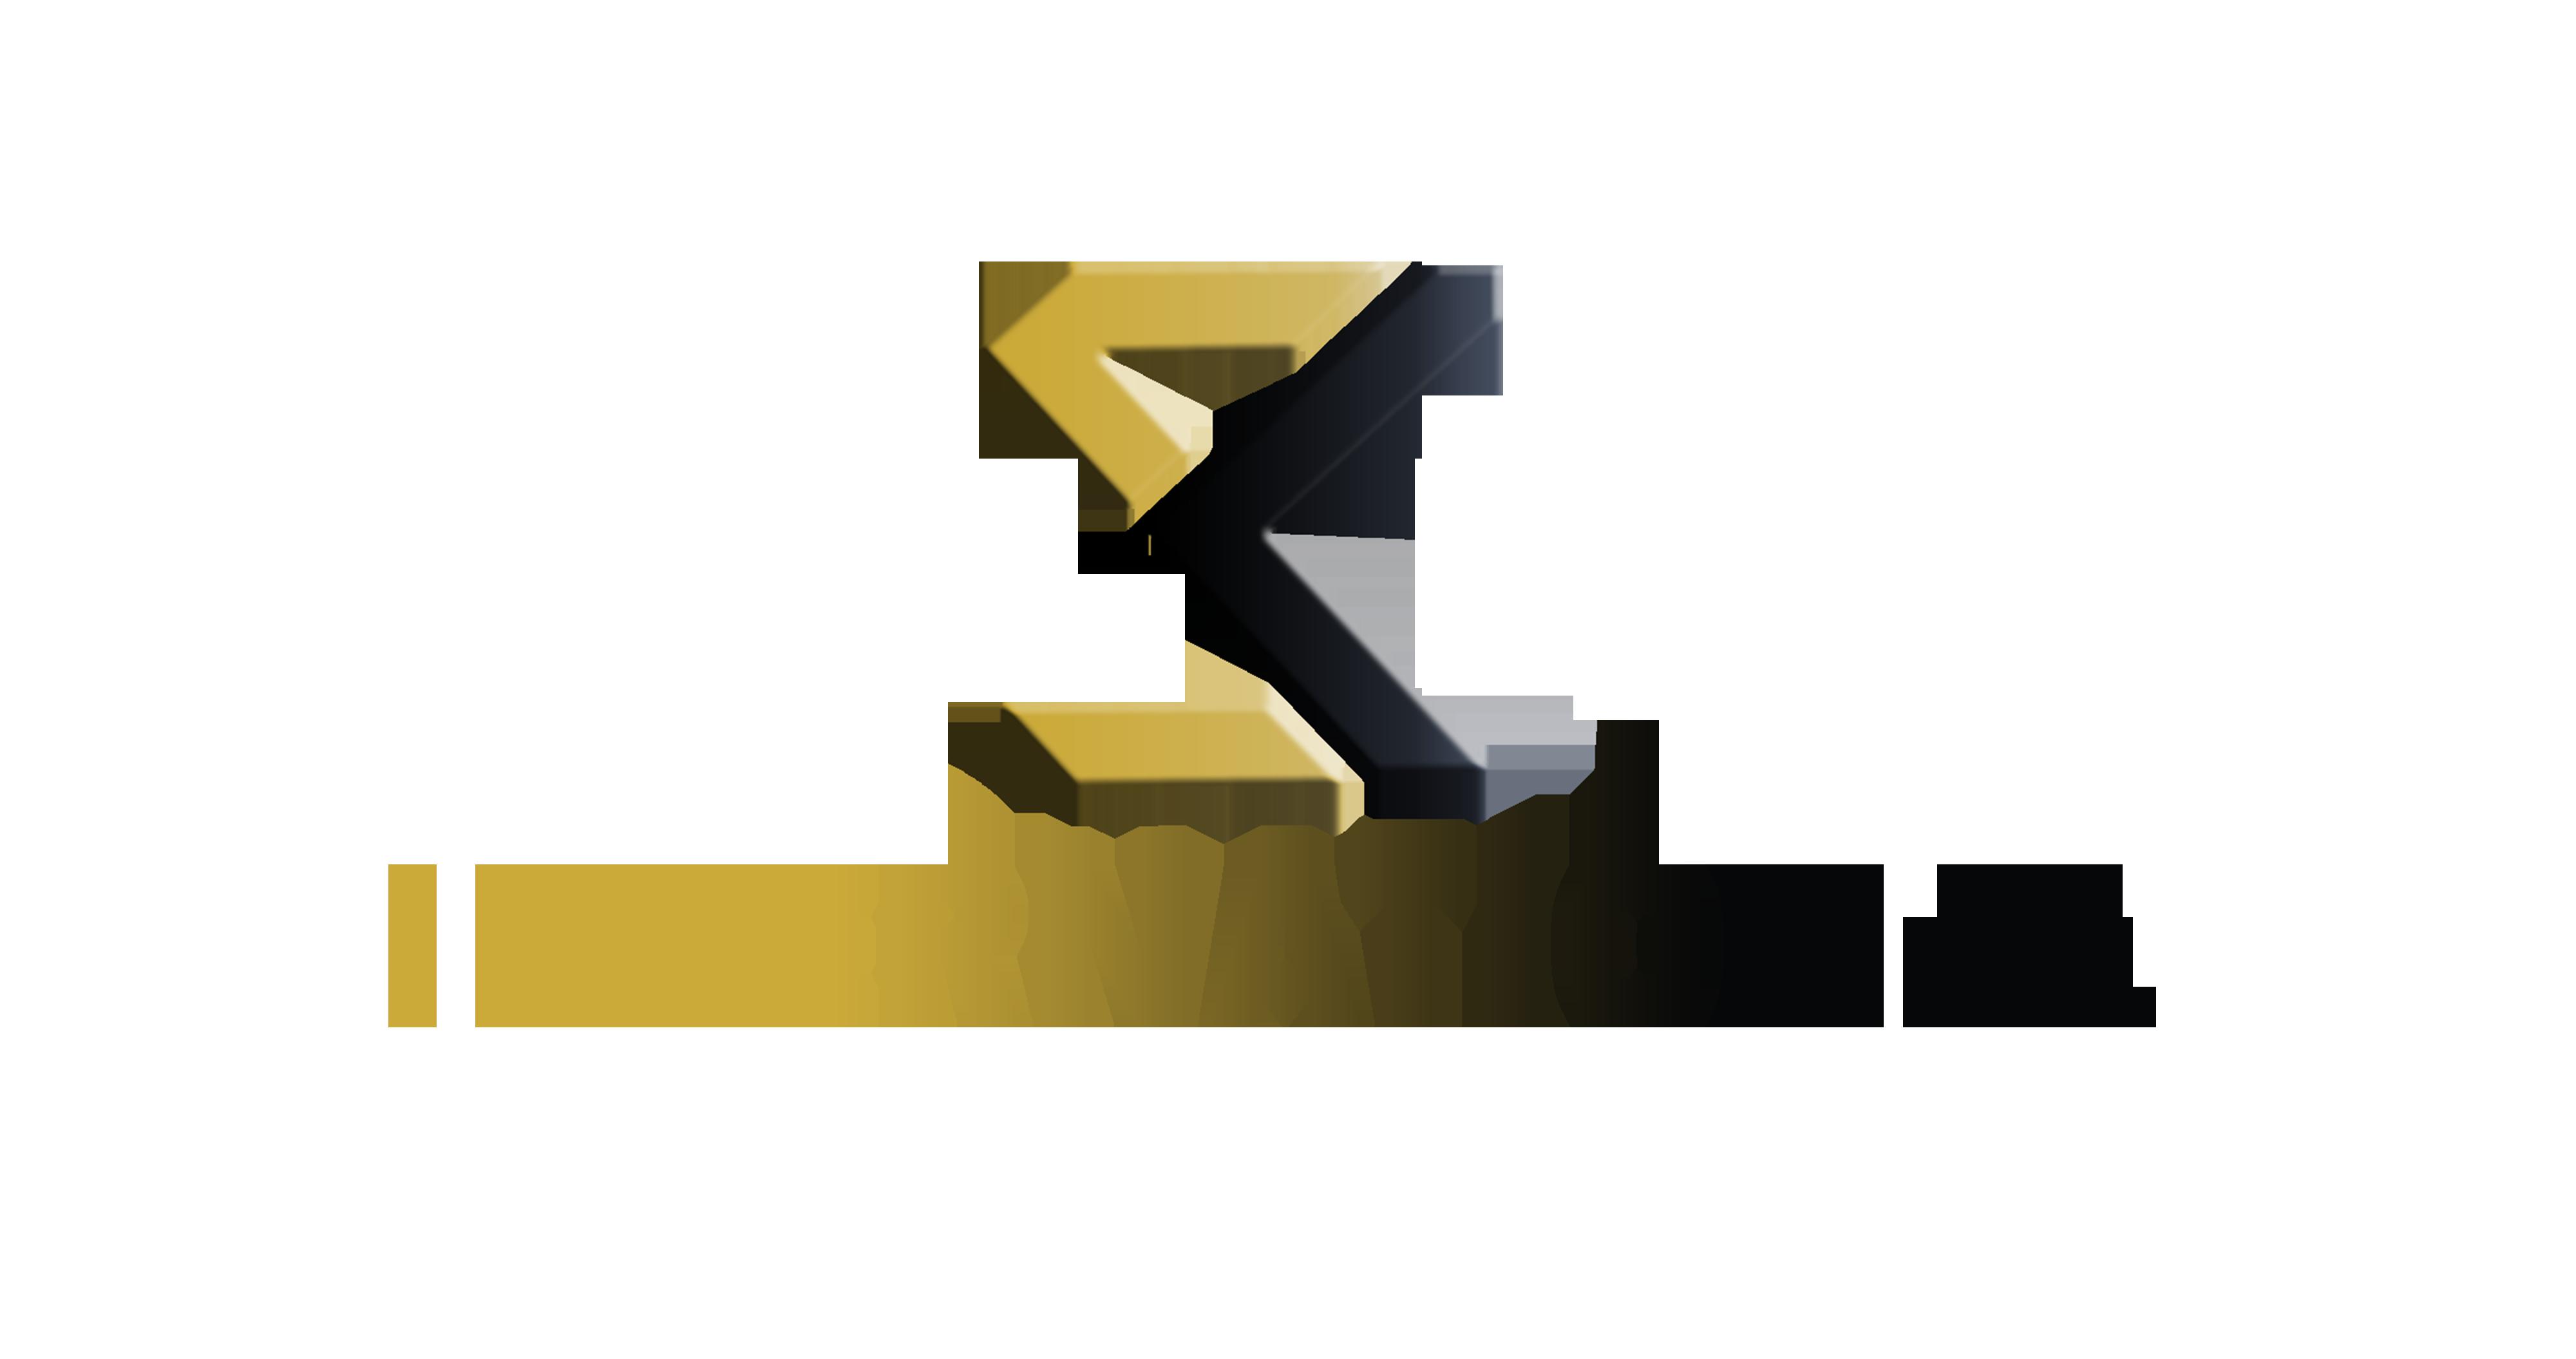 s.k. internationals